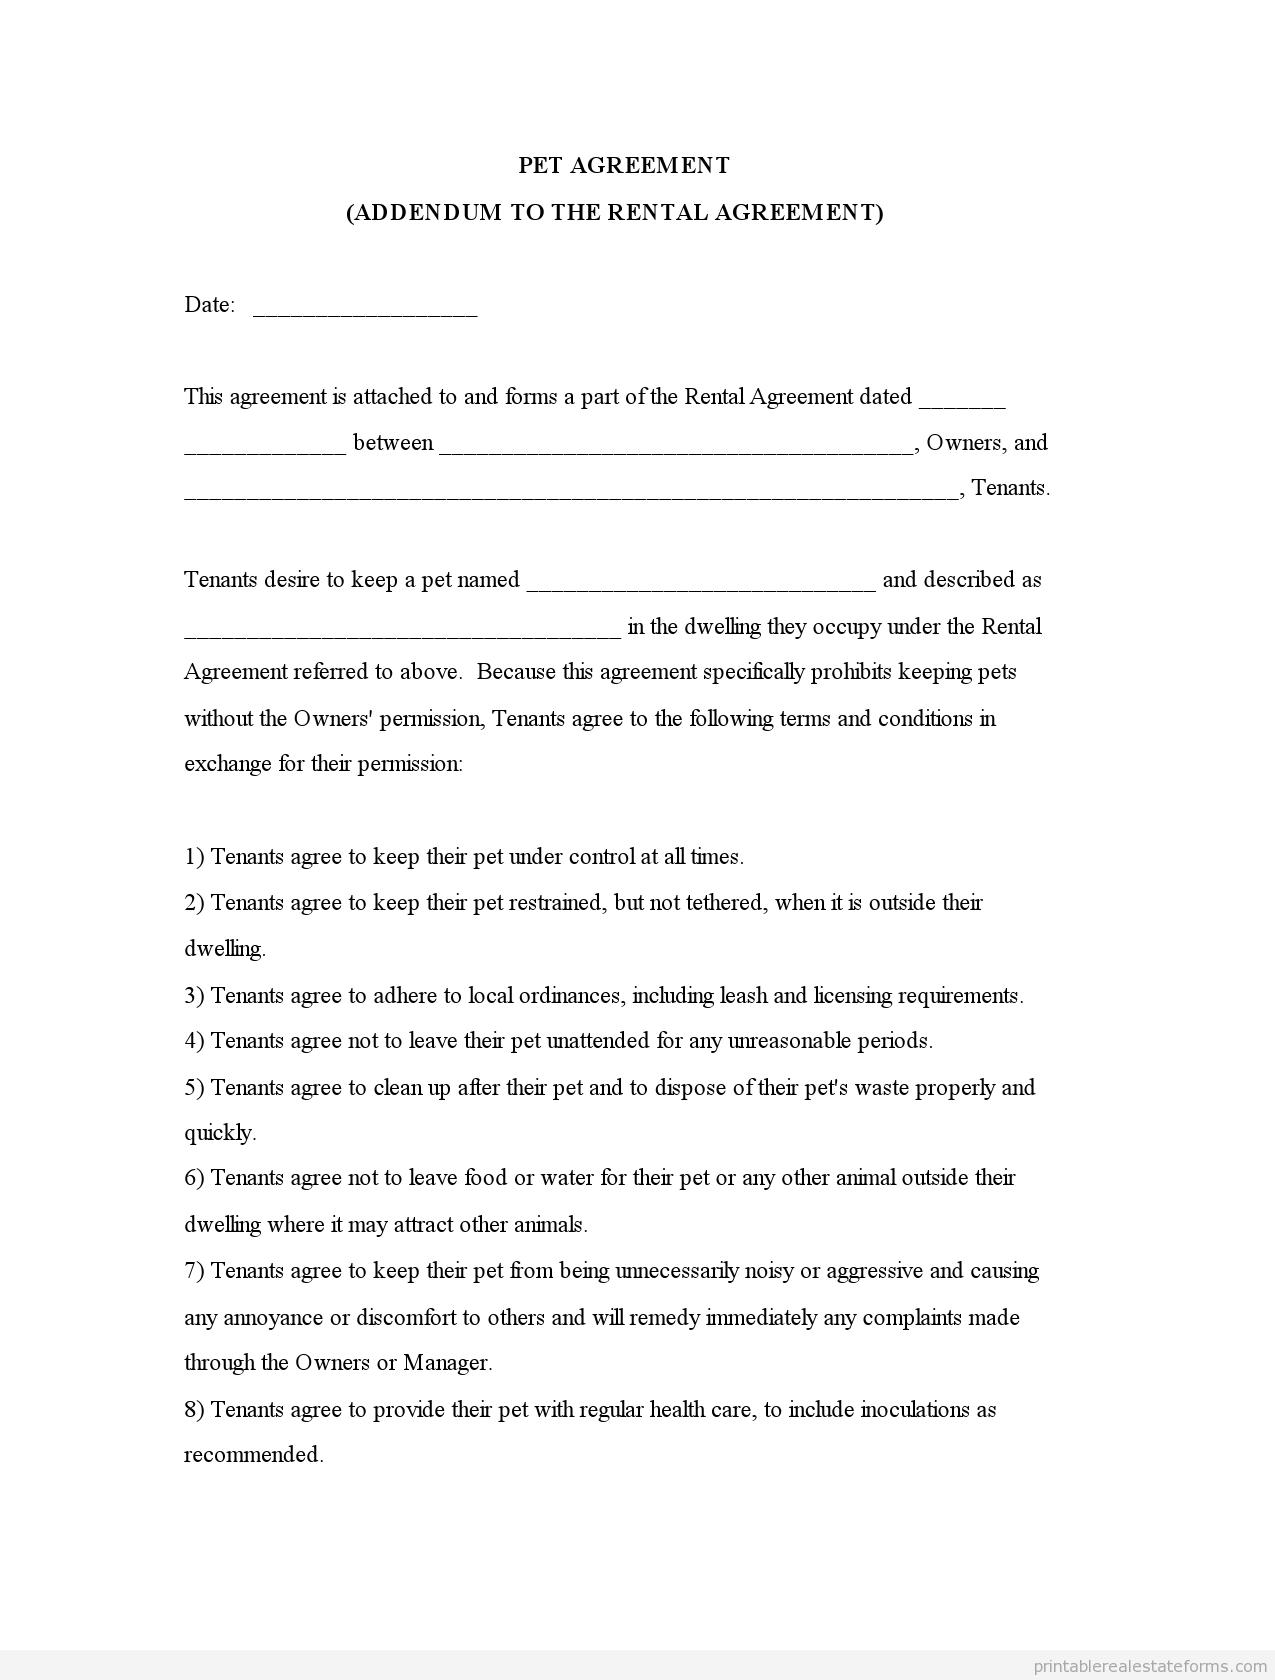 Sample Printable Pet Agreementm Addendum To The Rental Agreement - Free Printable Pet Addendum